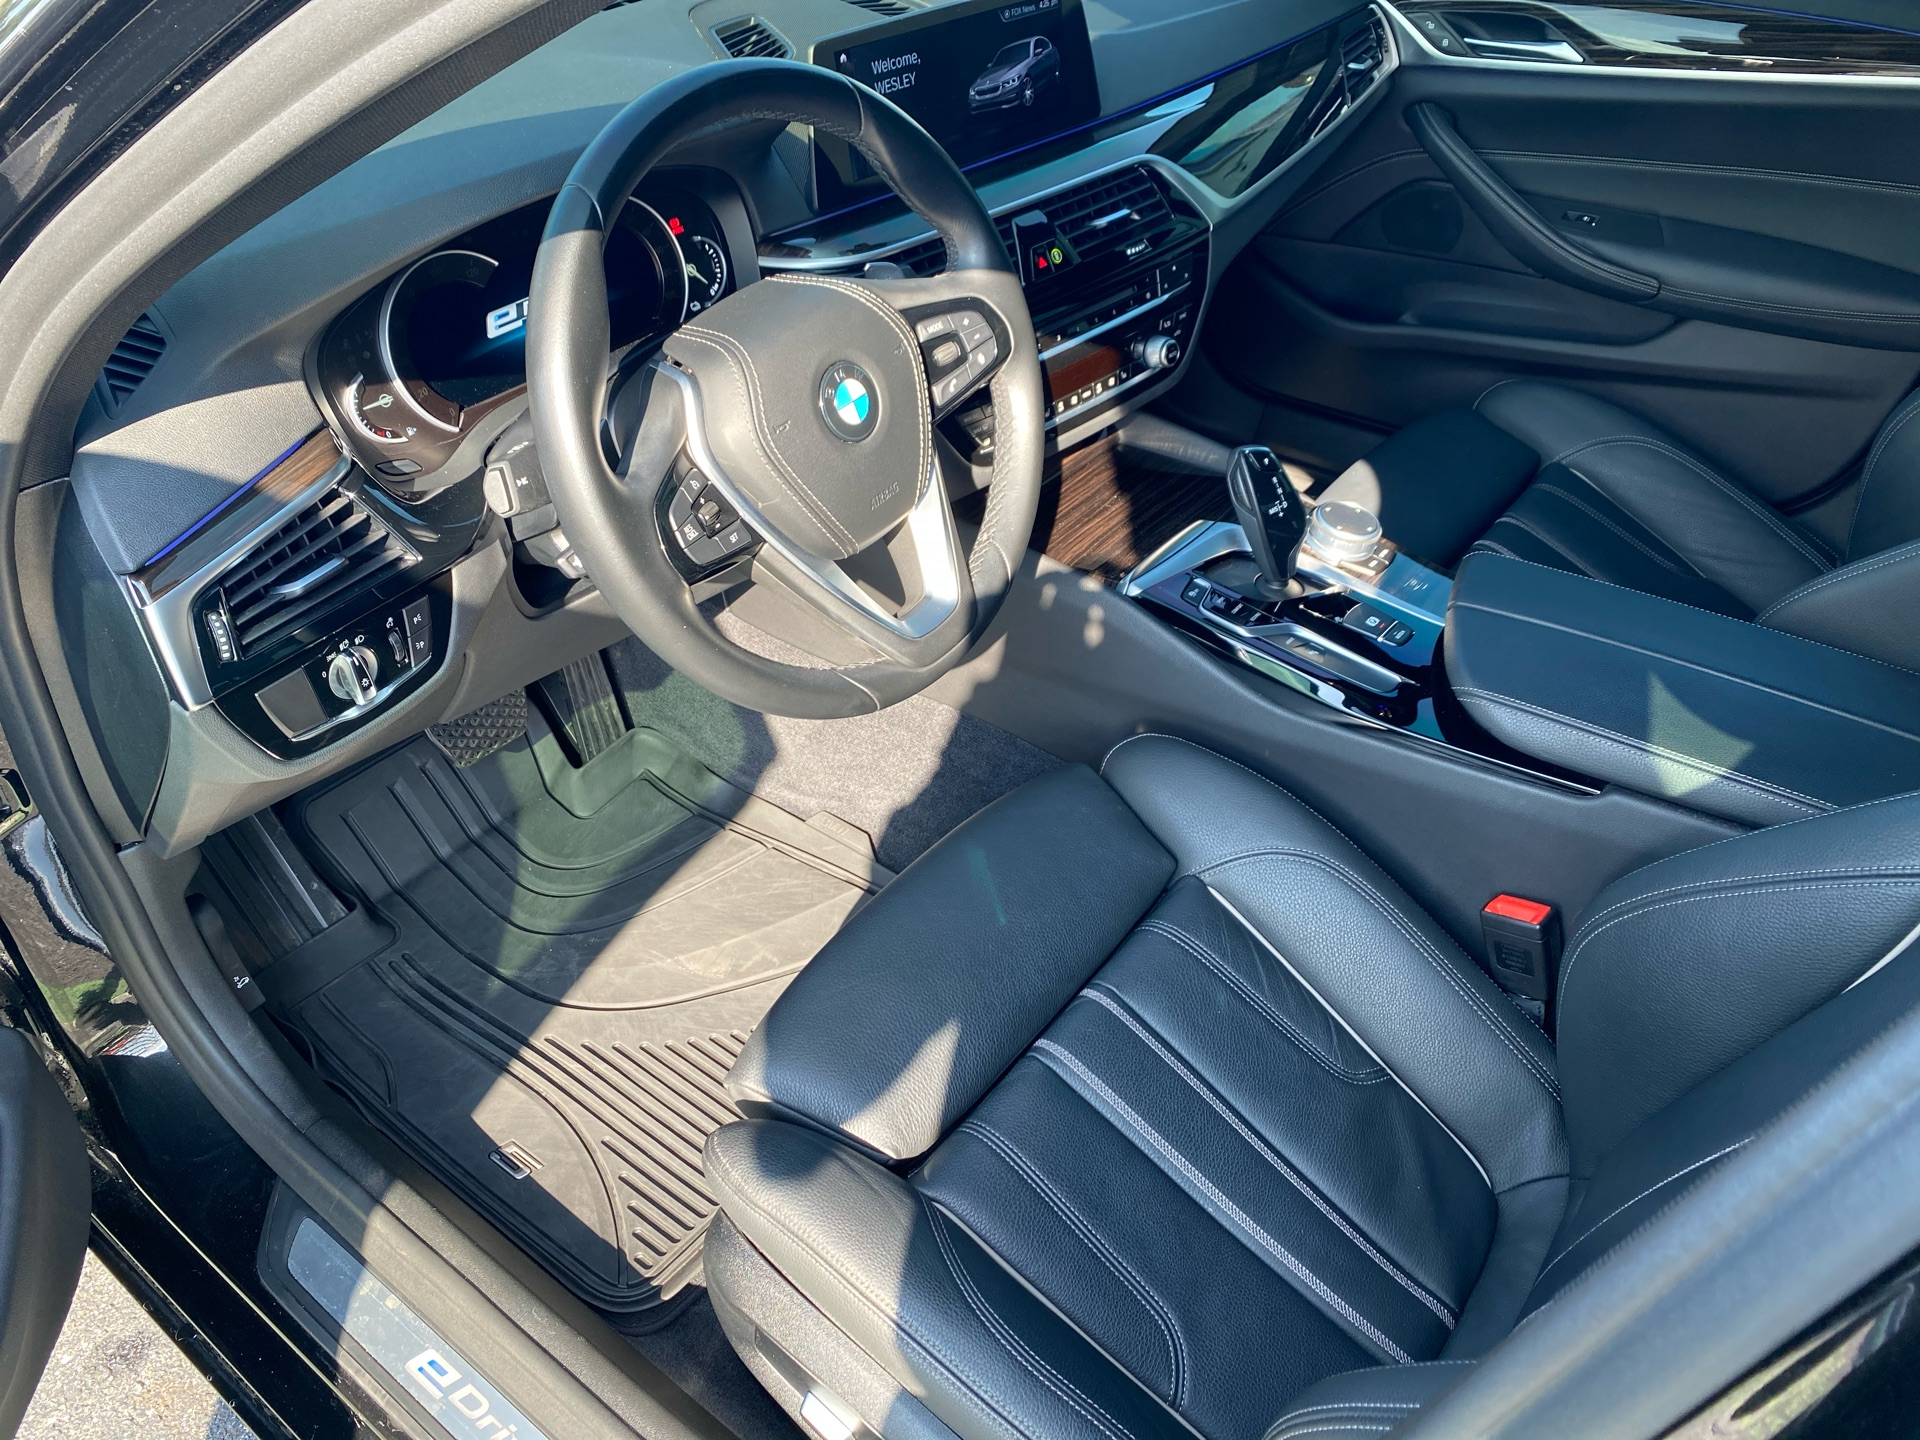 2019 BMW 5 Series - photo 3